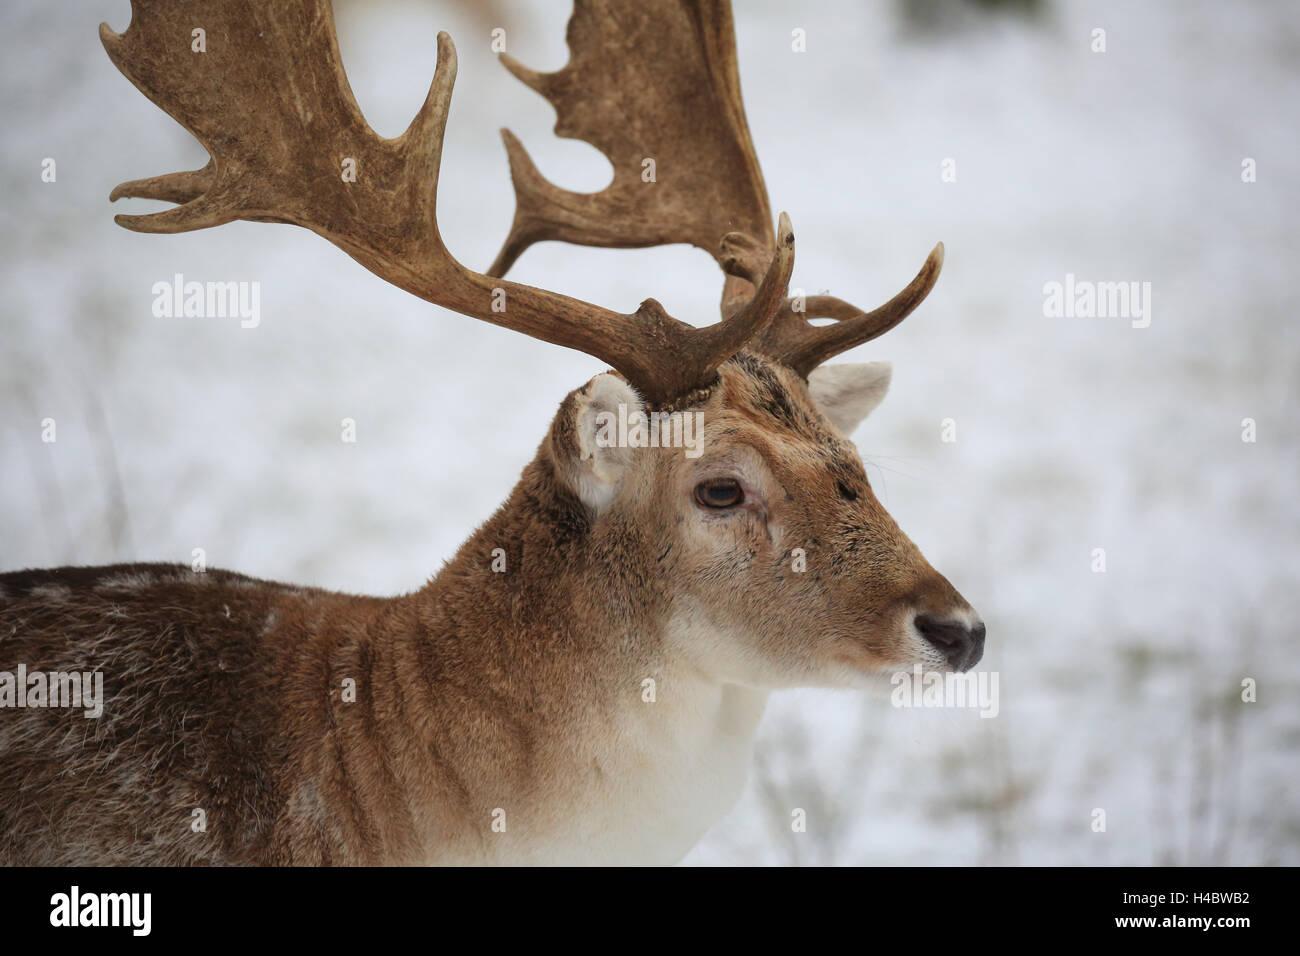 Fallow deer, Dama dama - Stock Image